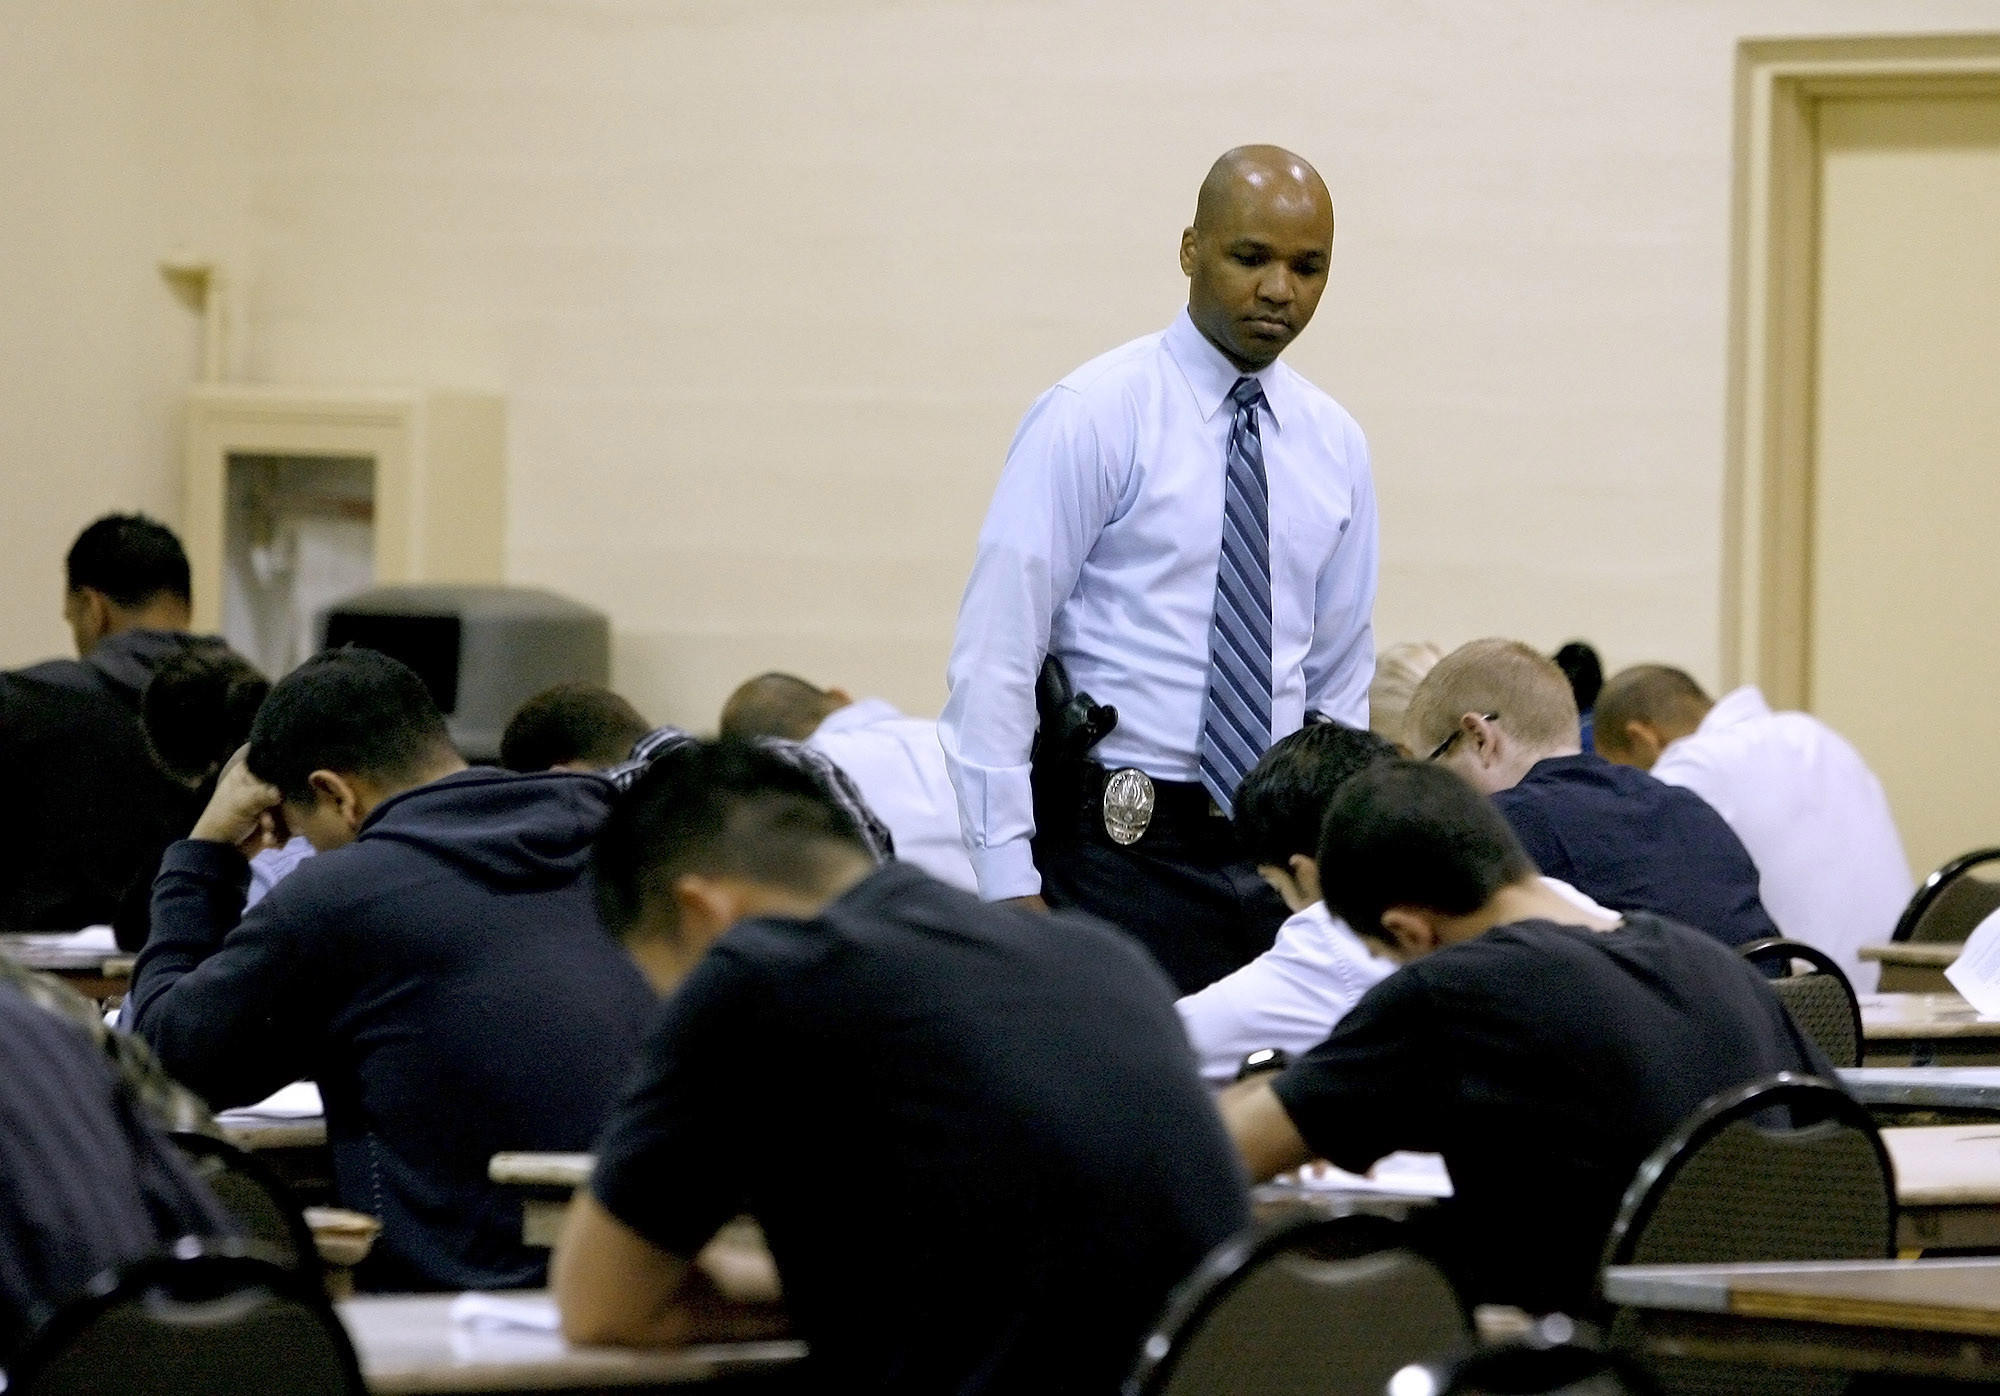 Glendale Police Detective Victor Jackson keeps an eye on applicants taking the police officer recruit written exam at the Glendale Civic Auditorium in Glendale on Thursday, Nov. 1, 2012.